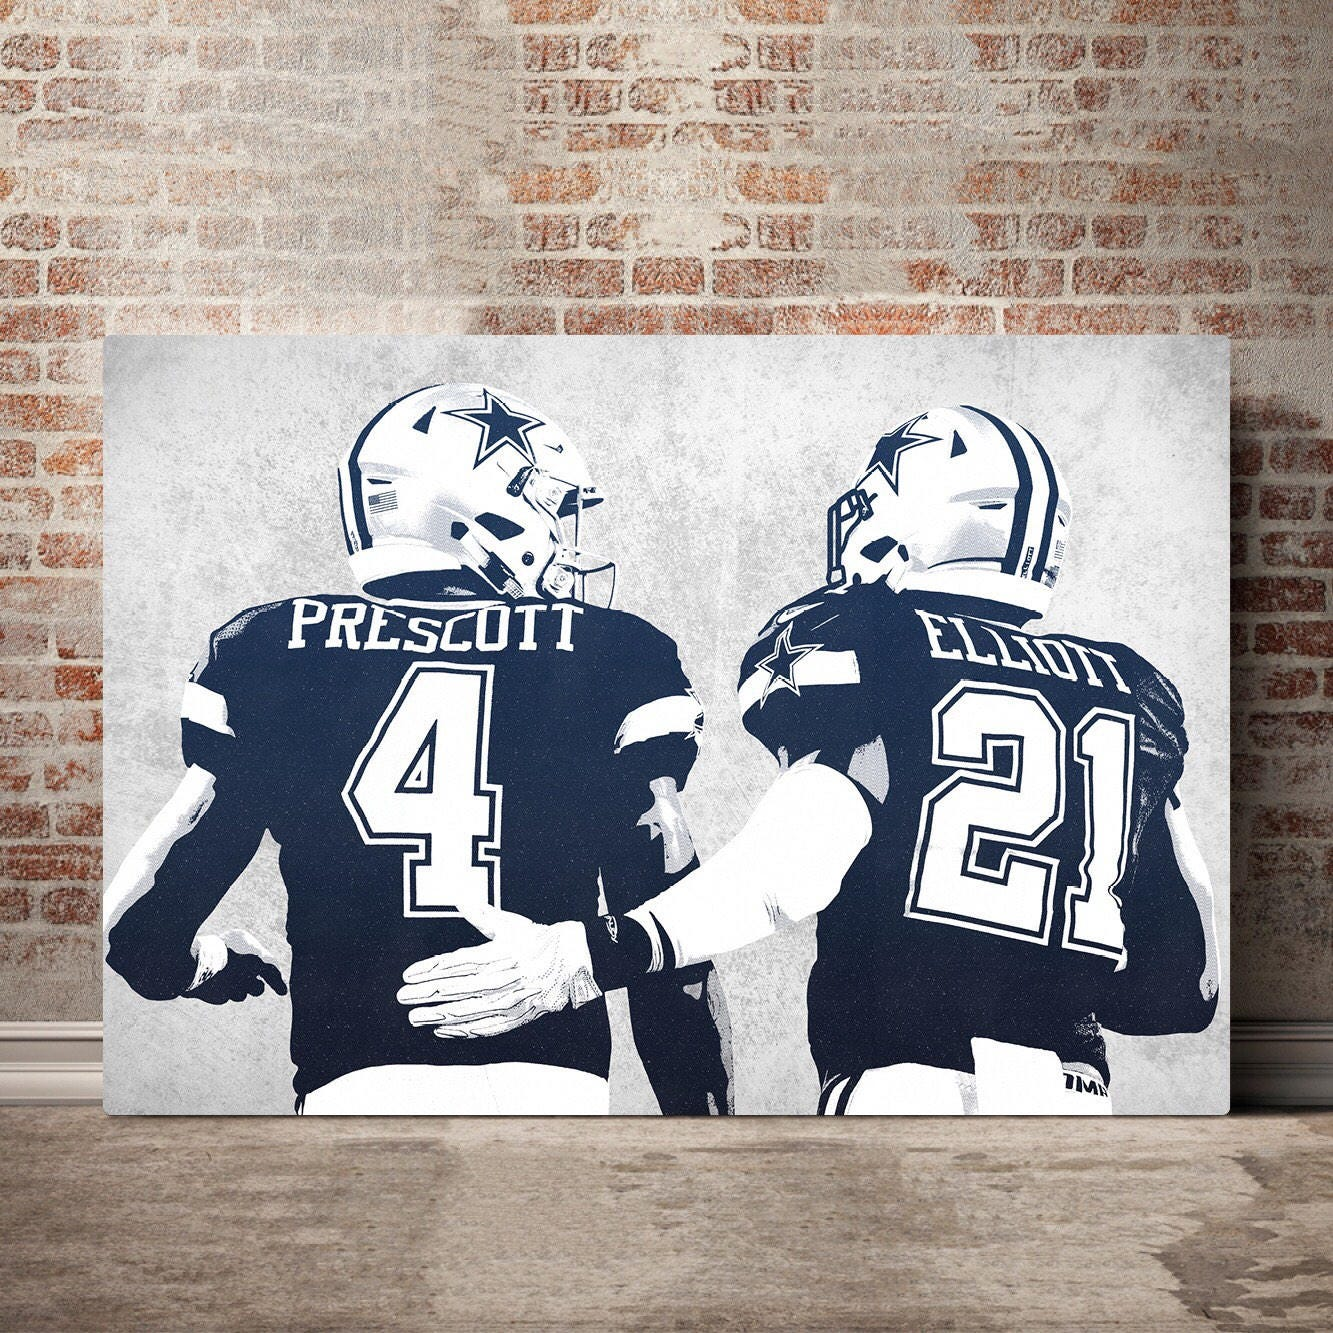 5 Panel Dallas Cowboys Canvas Prints Painting Wall Art Nfl: Dallas Cowboys Canvas Print Dallas Cowboys Art Dallas